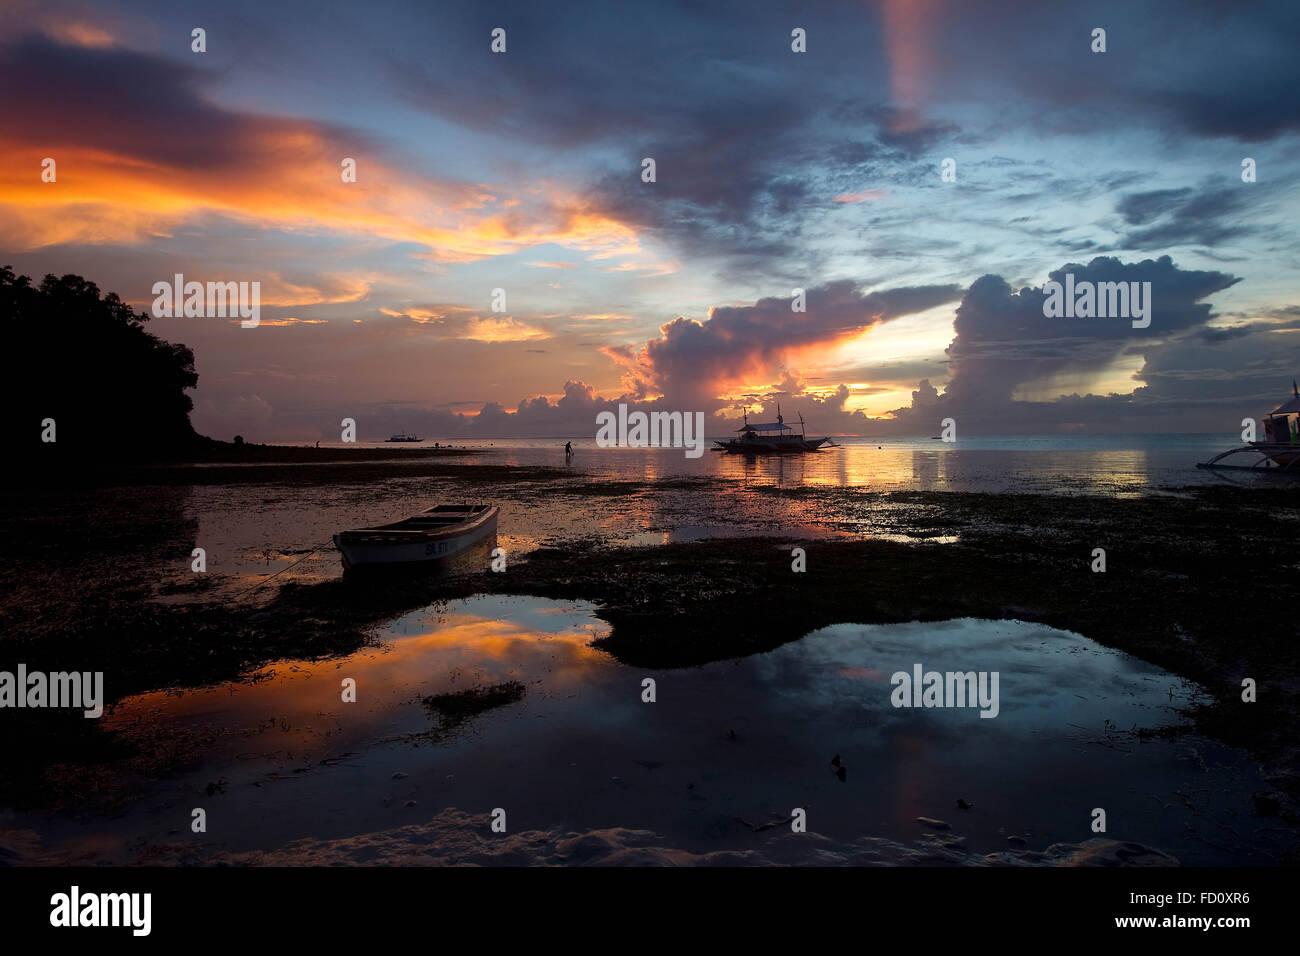 Sunset, Malapascua Island,Philippines Stock Photo